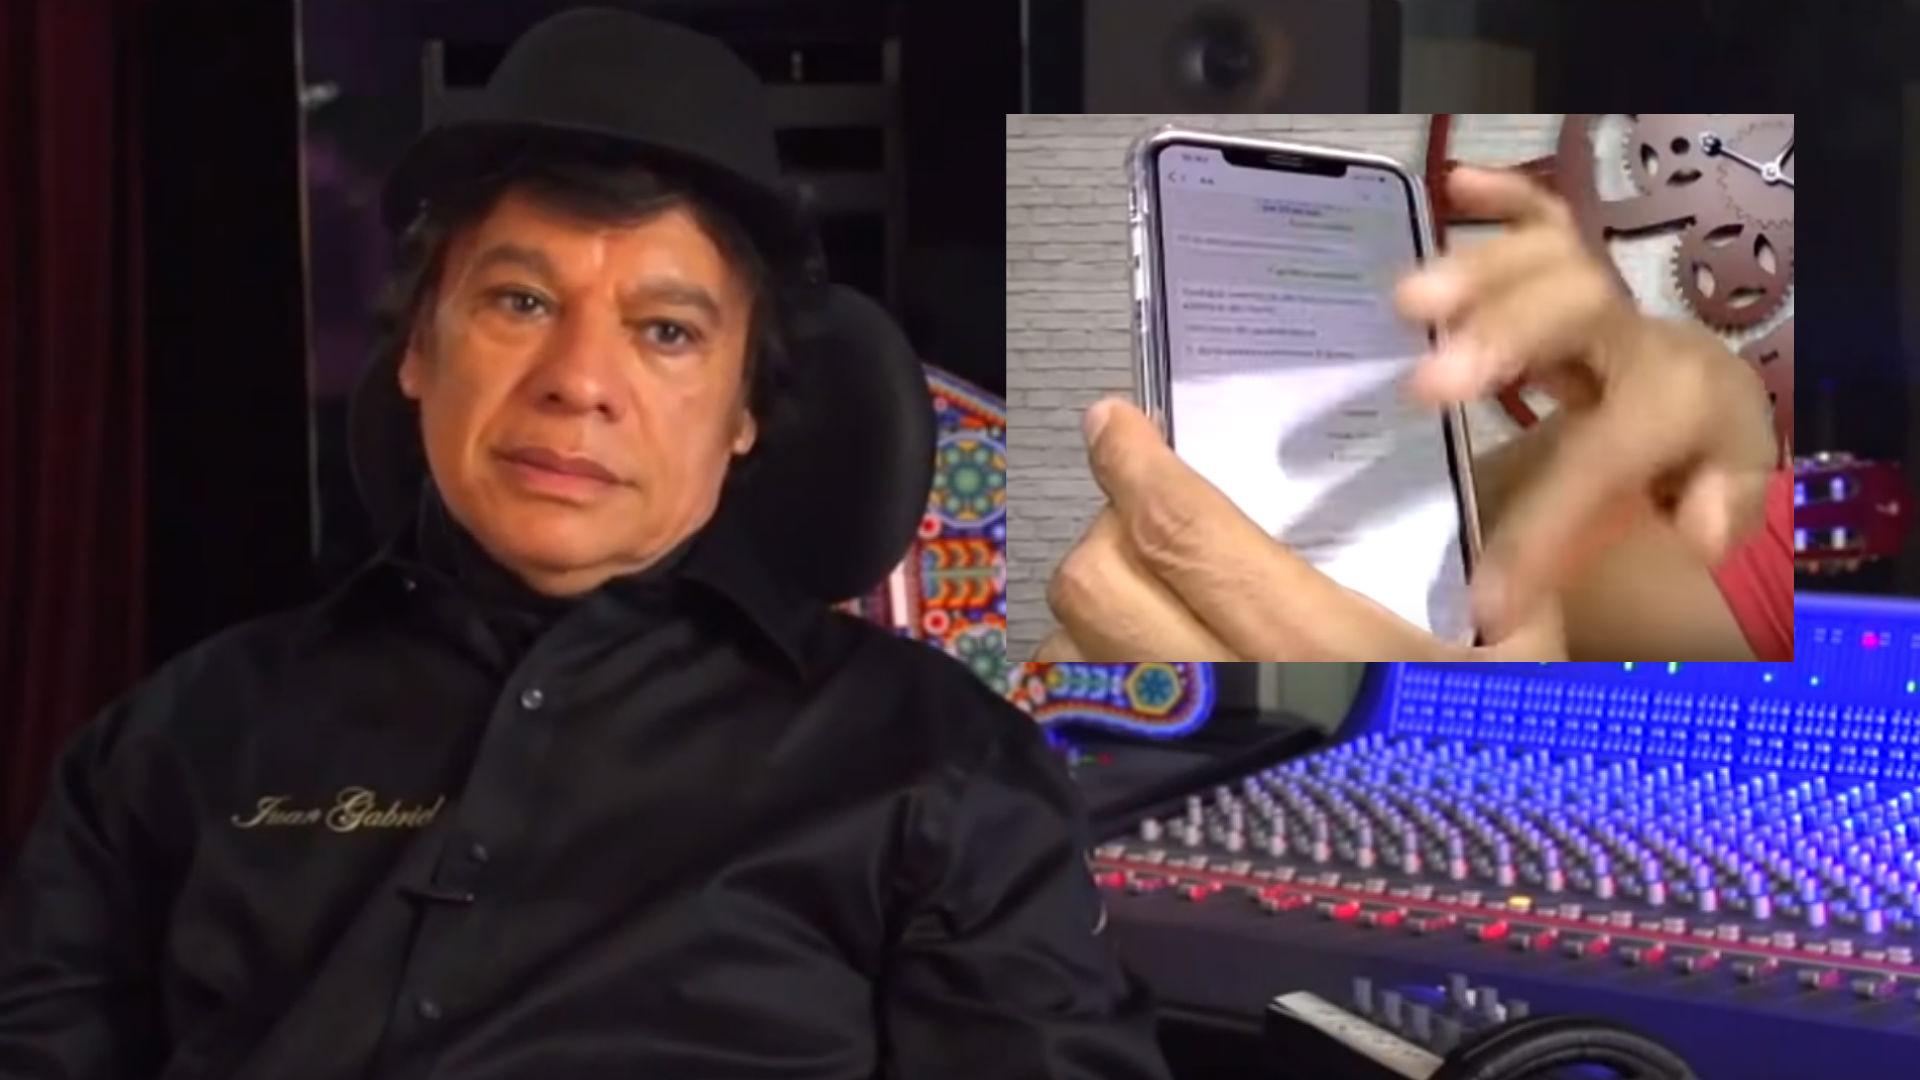 Juan Gabriel quiere volver pero no para cantar, afirma periodista mexicano (Foto: YouTube Juan Gabriel Club, productora69 )